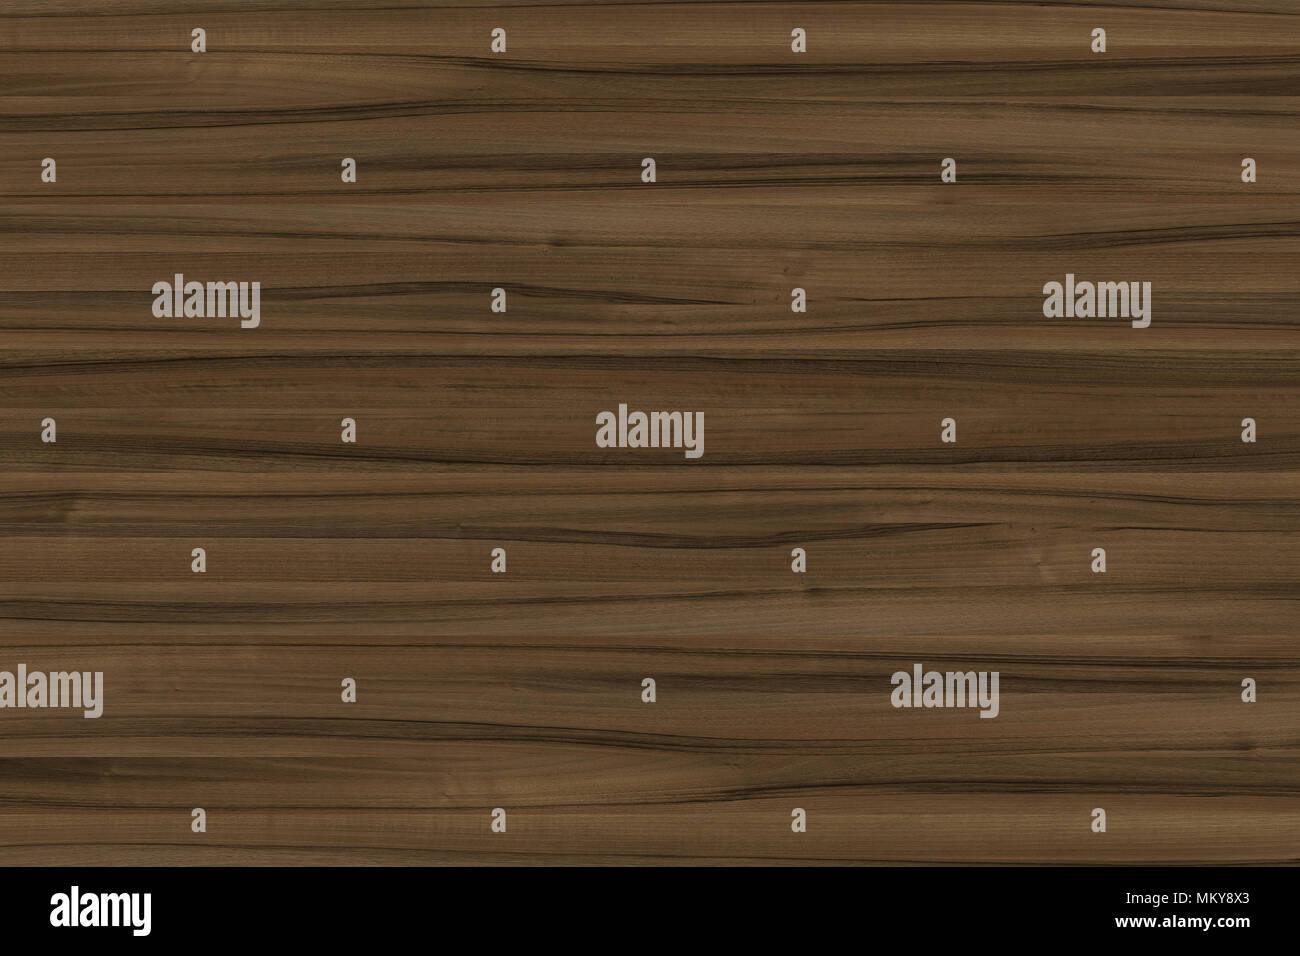 Background Texture Of Dark Wood   Stock Image